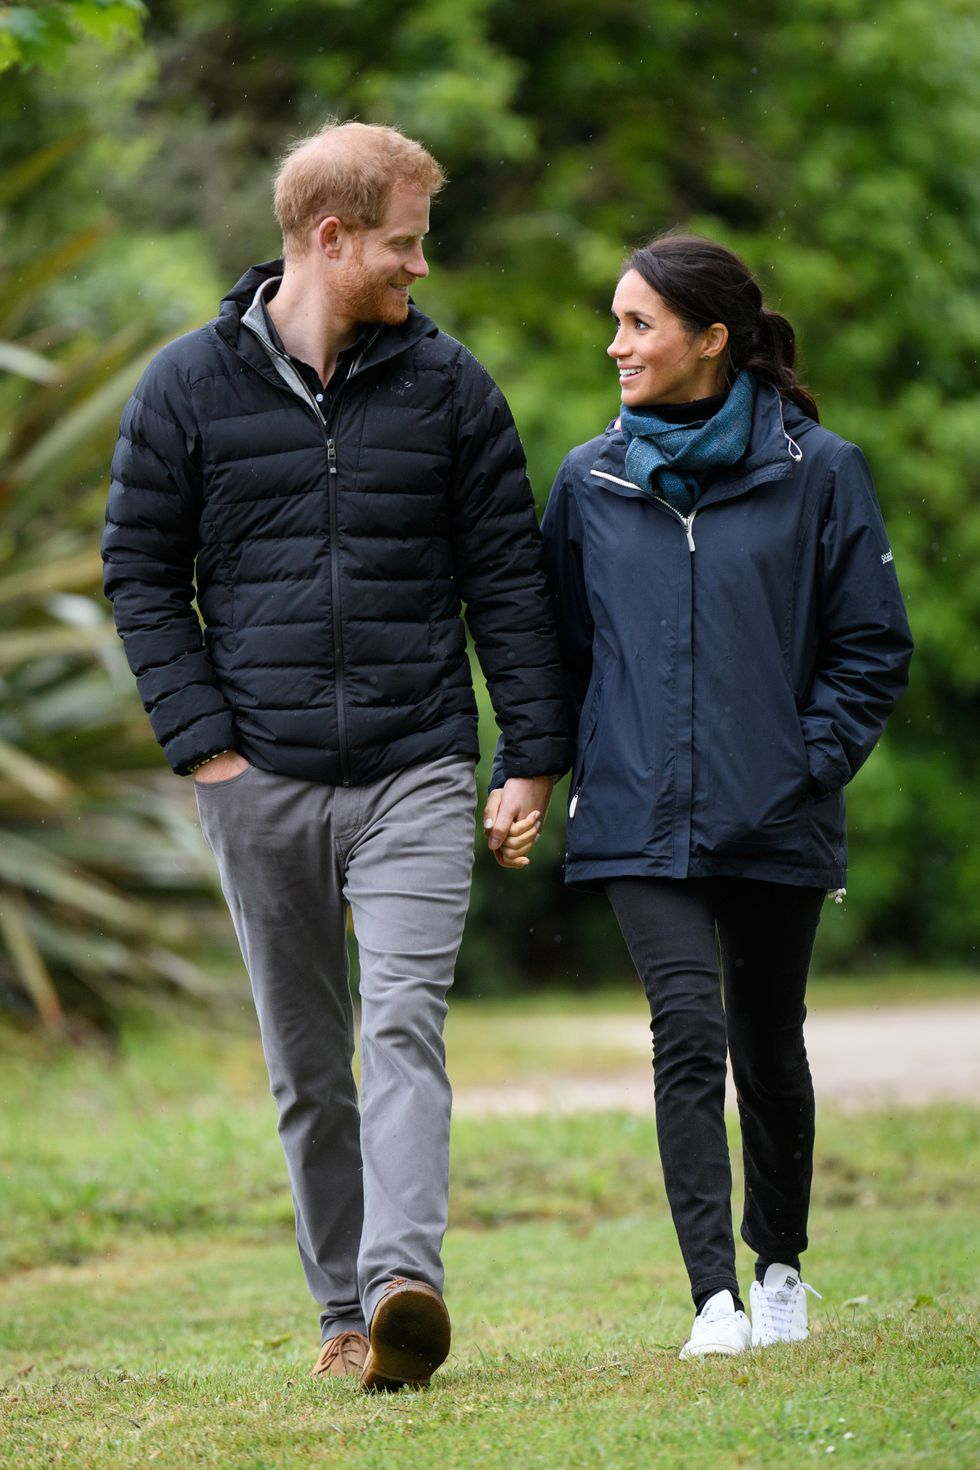 October 29, 2018. National Park, New Zealand